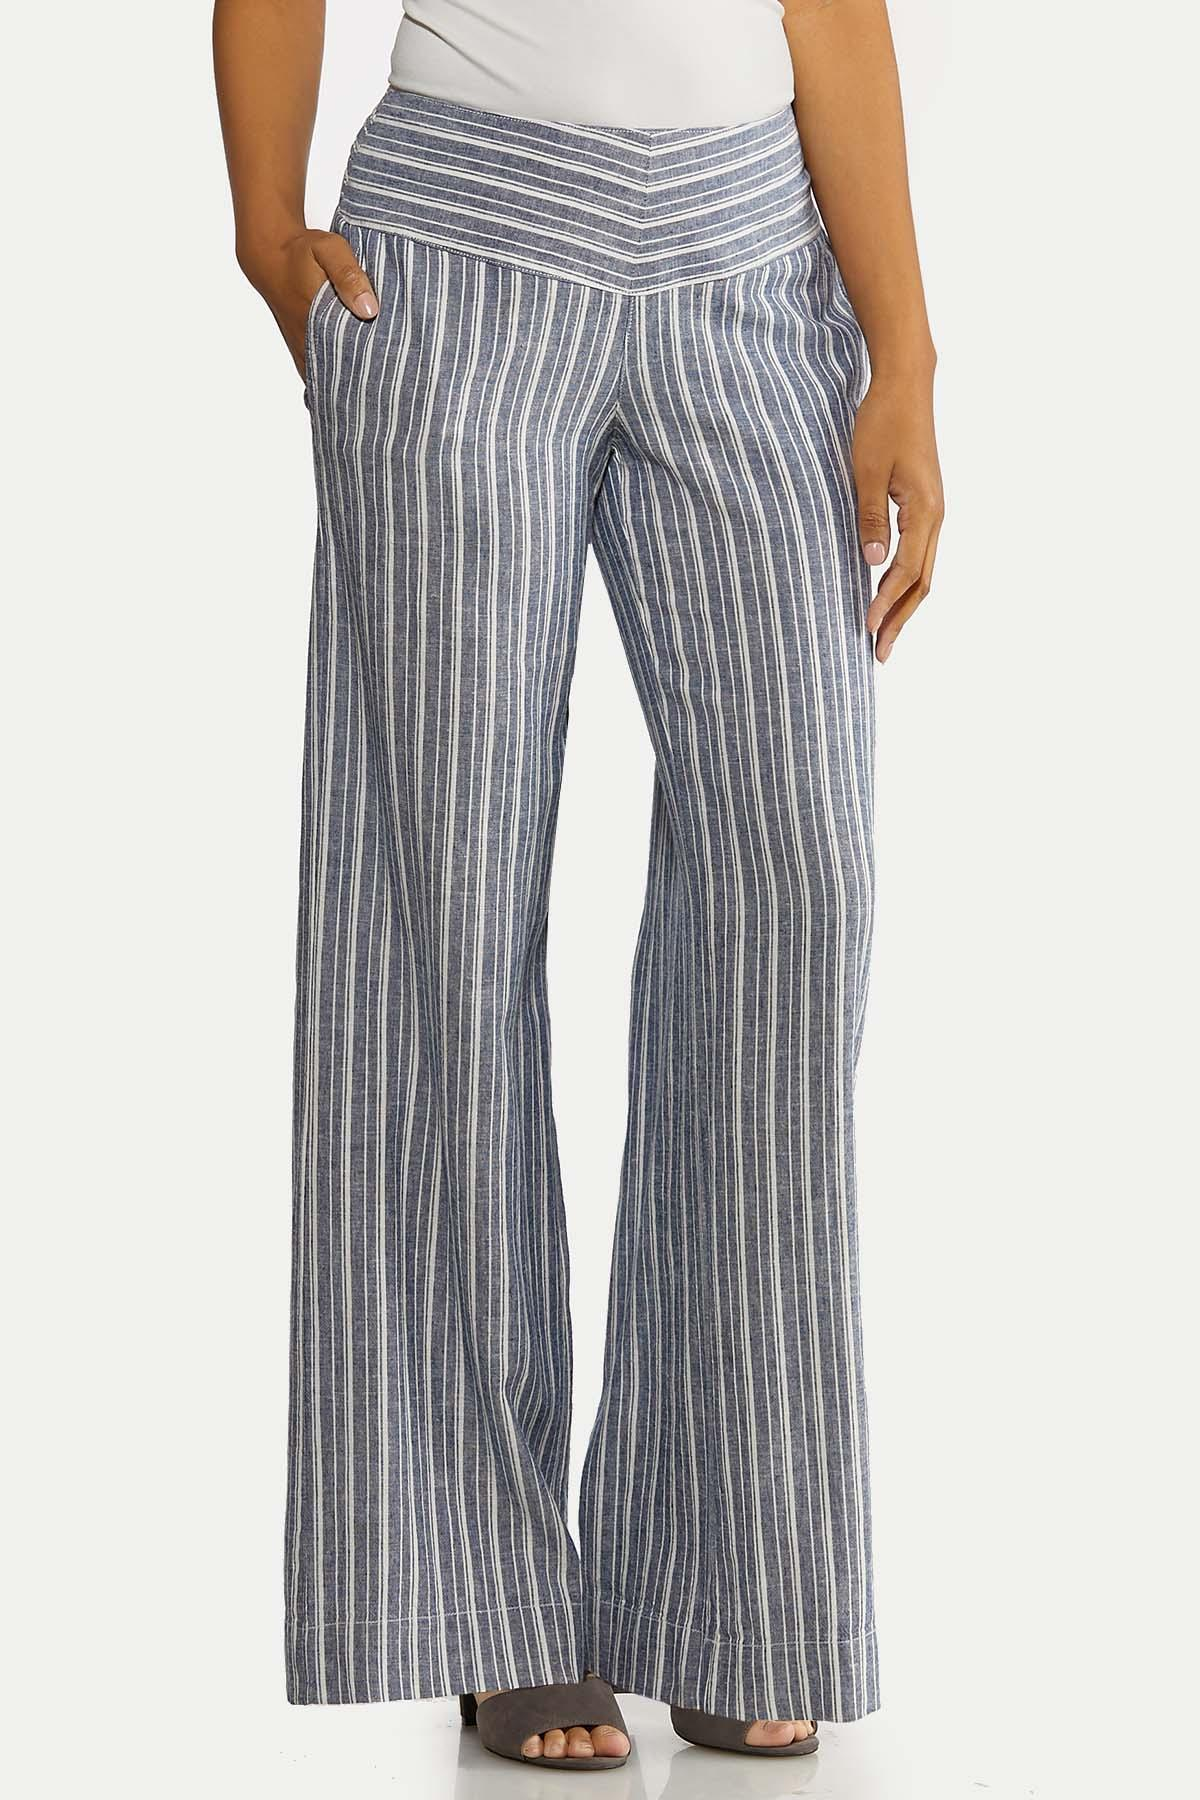 Blue Stripe Linen Pants